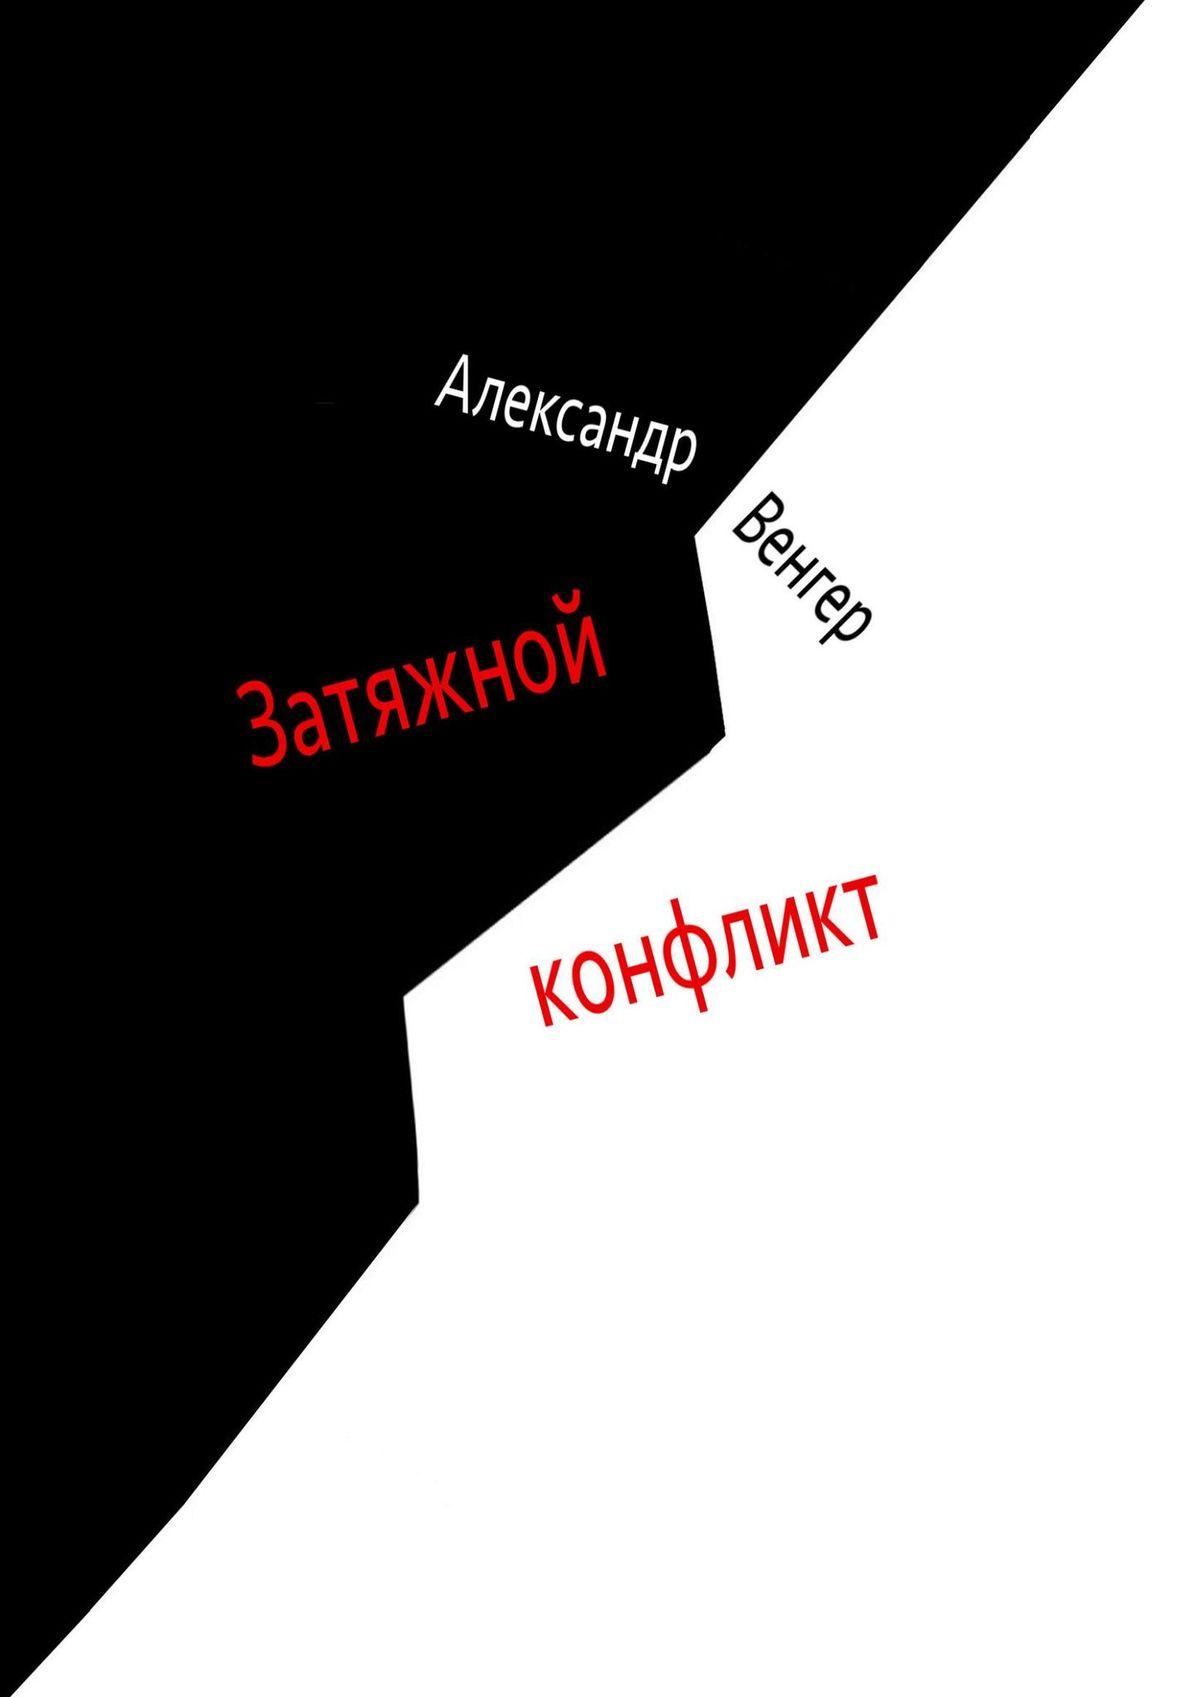 Александр Венгер Затяжной конфликт гордон макгил айра левин последняя схватка армагеддон 2000 ребенок розмари